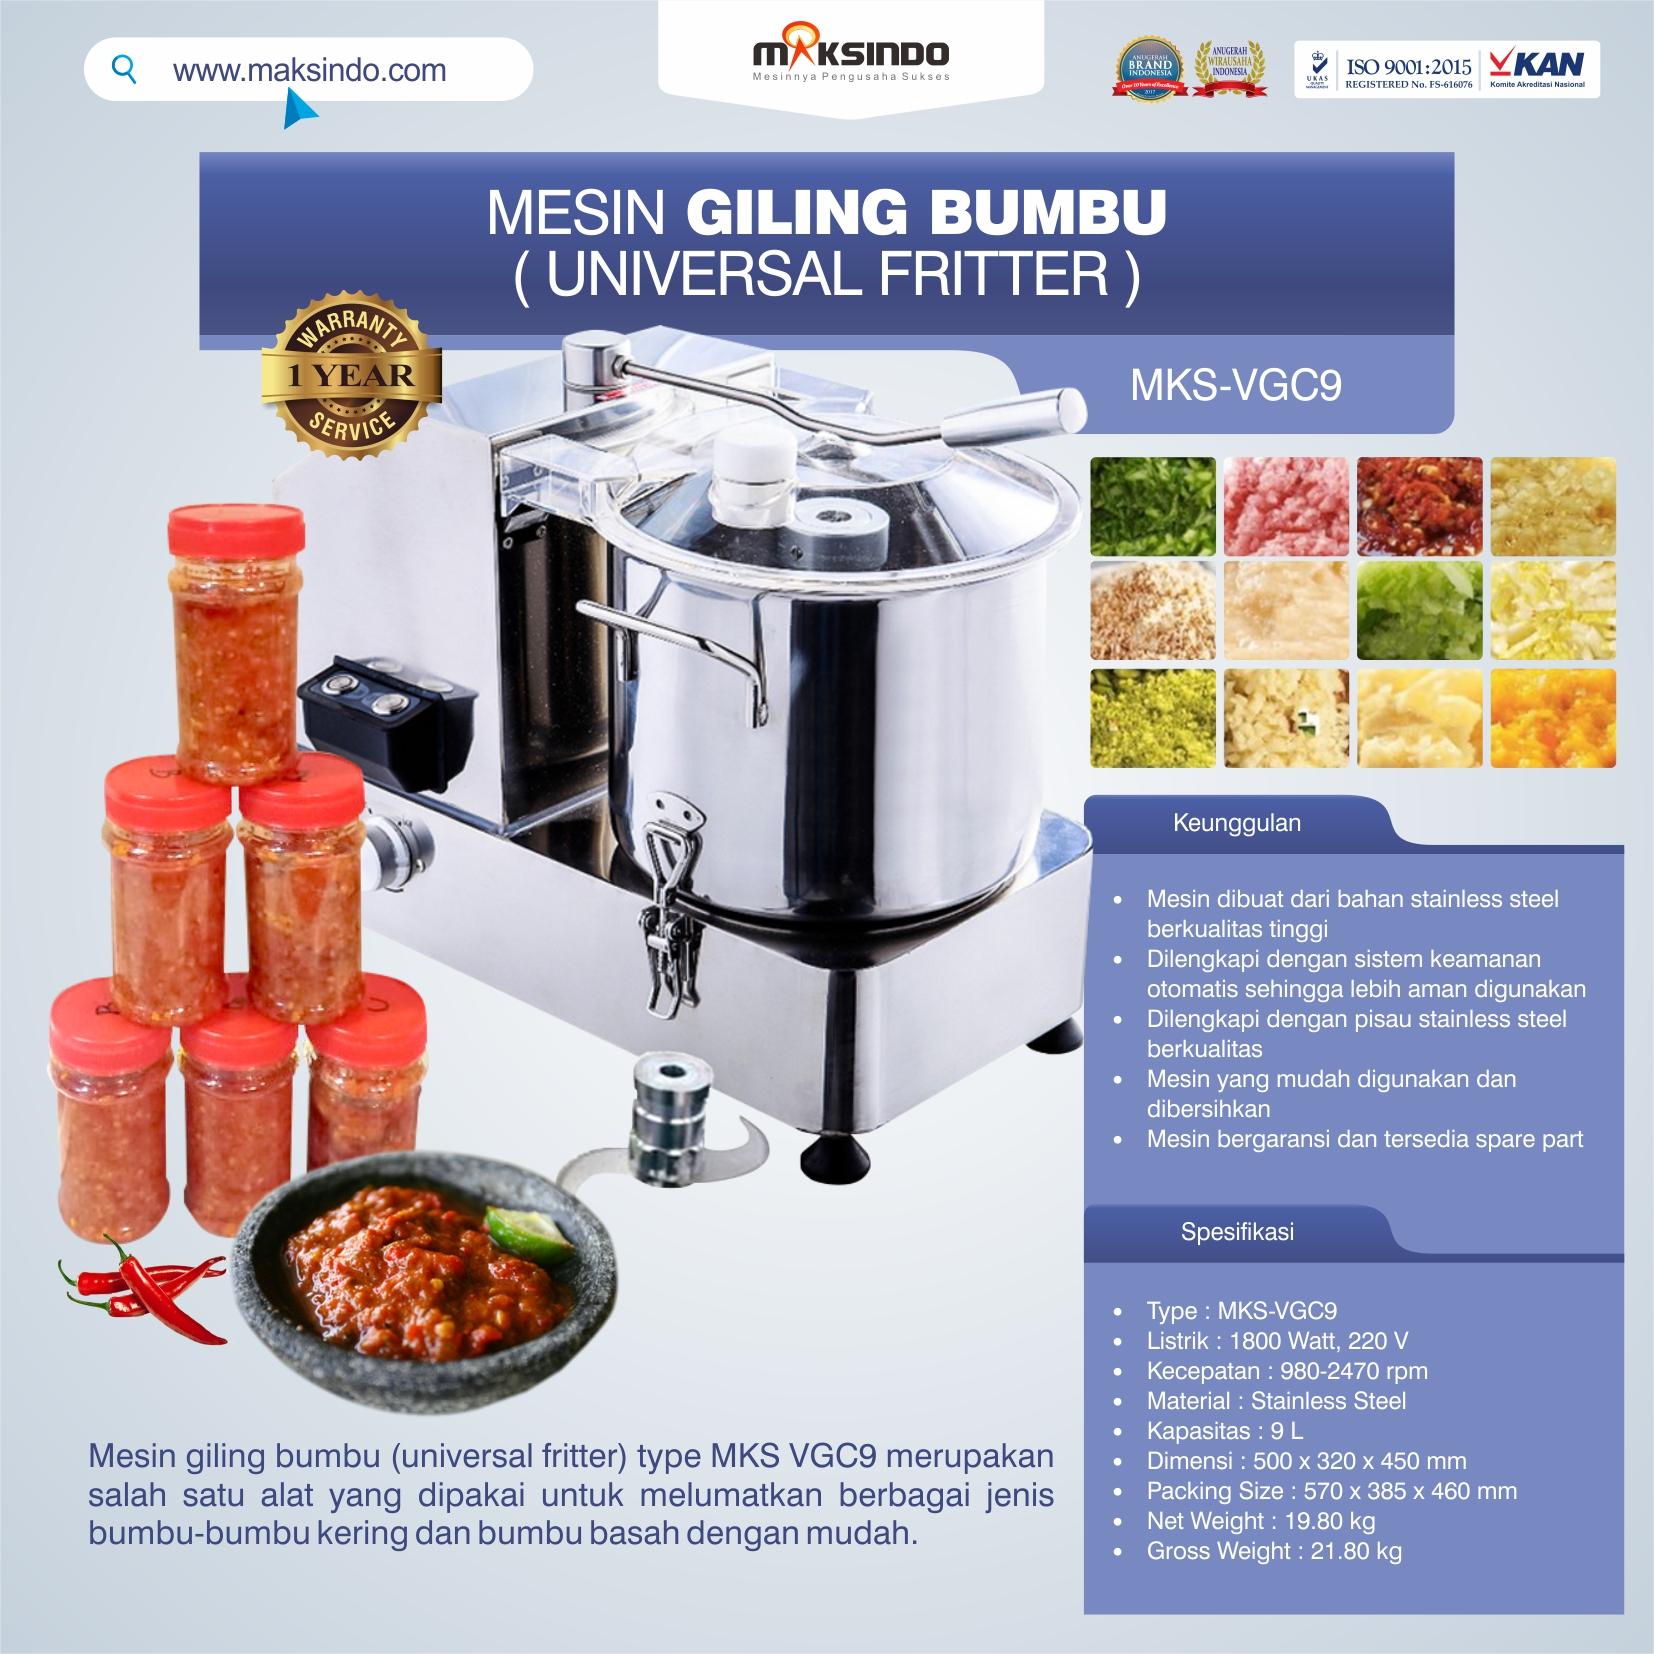 Jual Mesin Giling Bumbu (Universal Fritter) MKS VGC9 di Tangerang